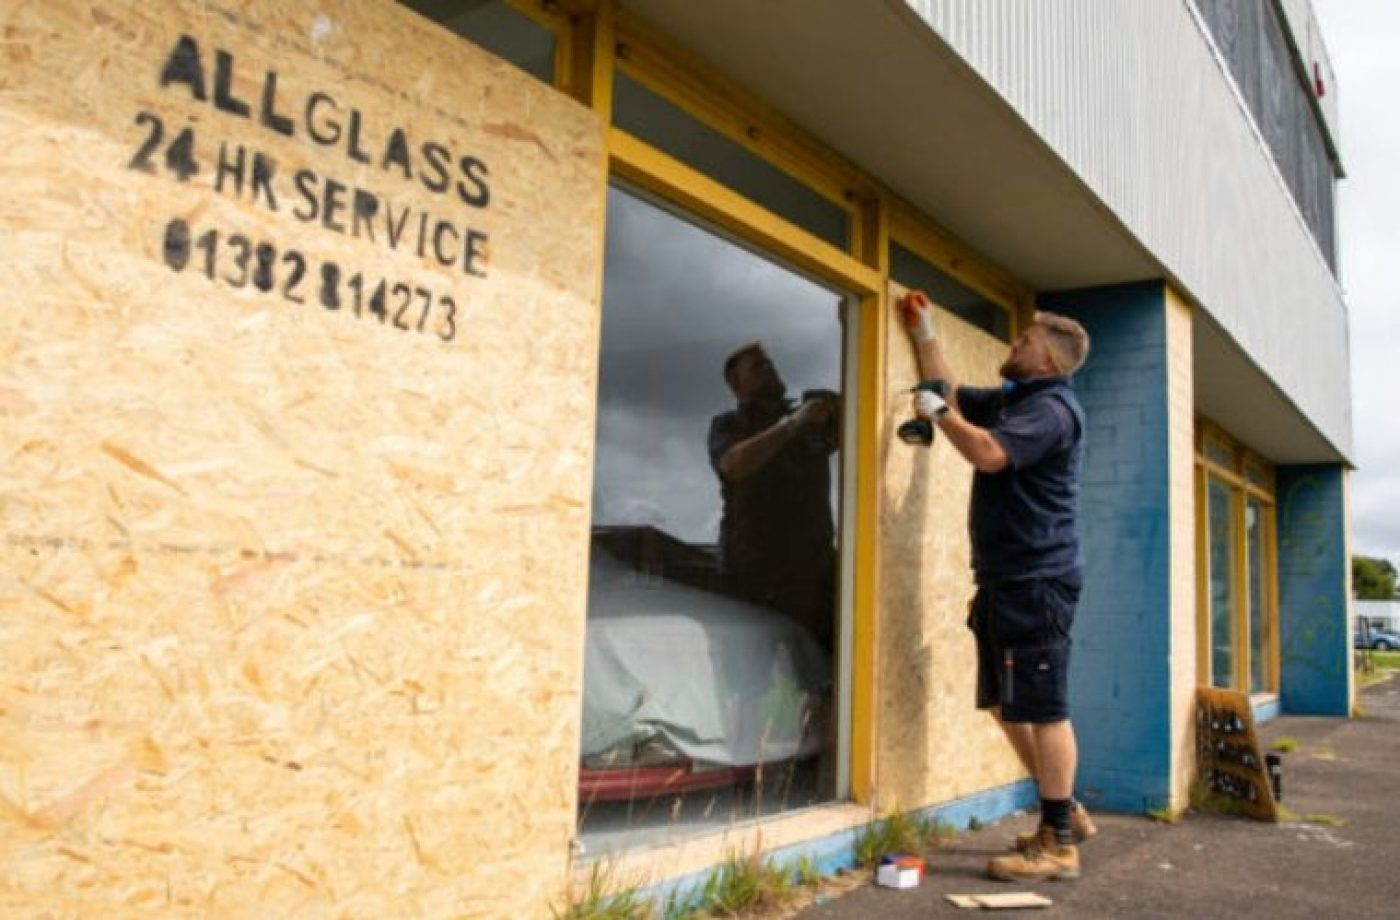 Garage owner offers reward for information following vandalism attack on business